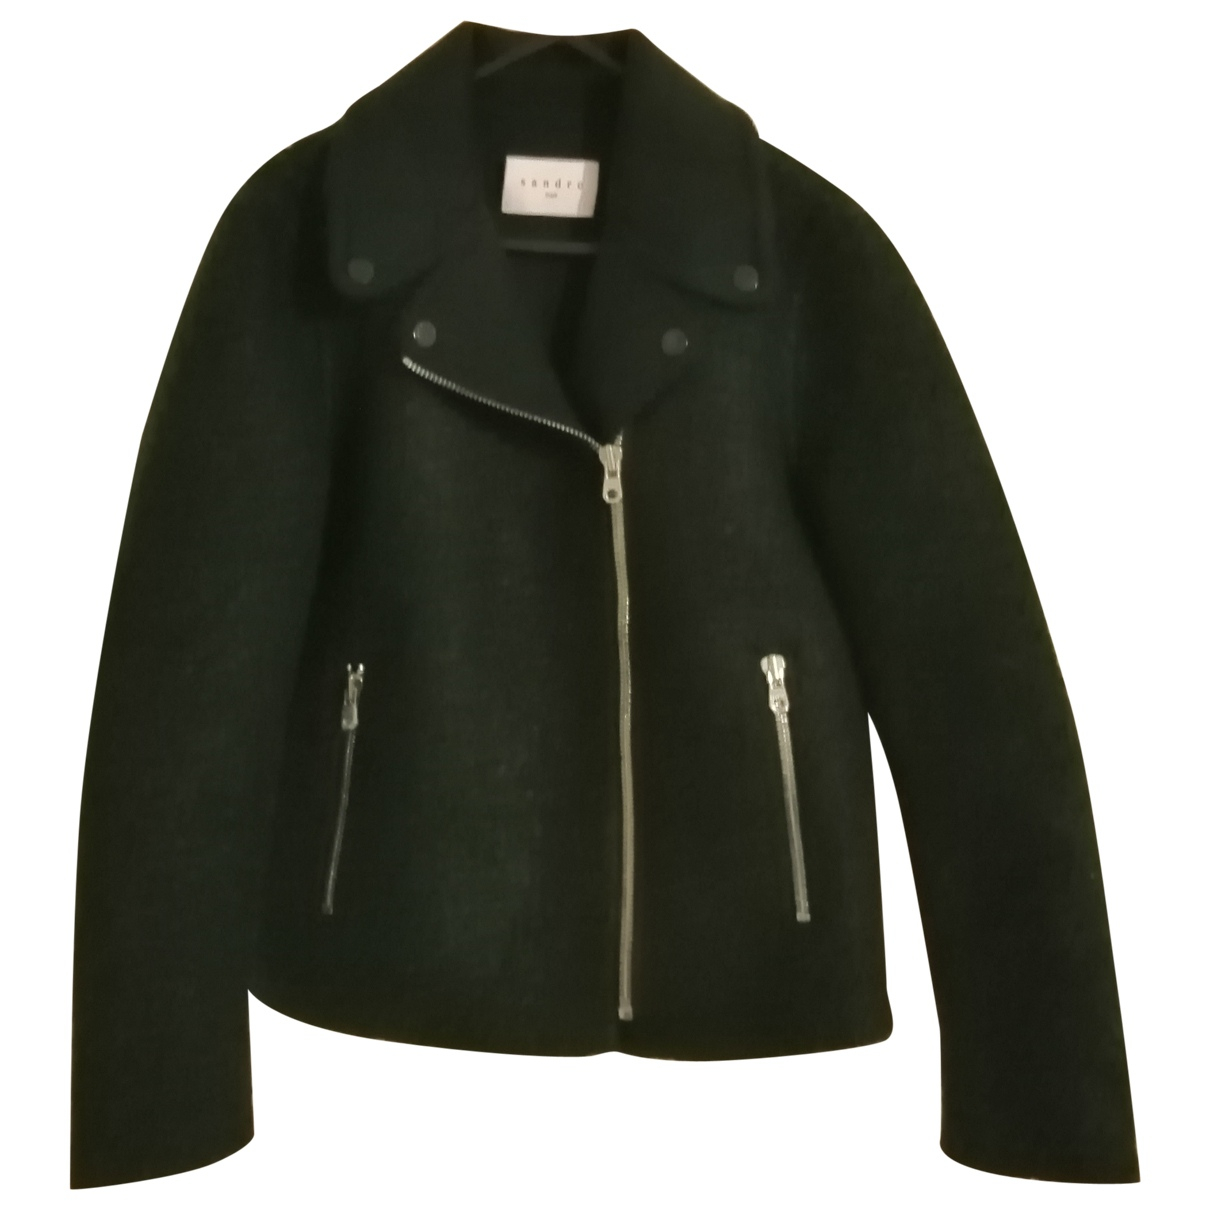 Sandro \N Green Wool jacket for Women 36 FR